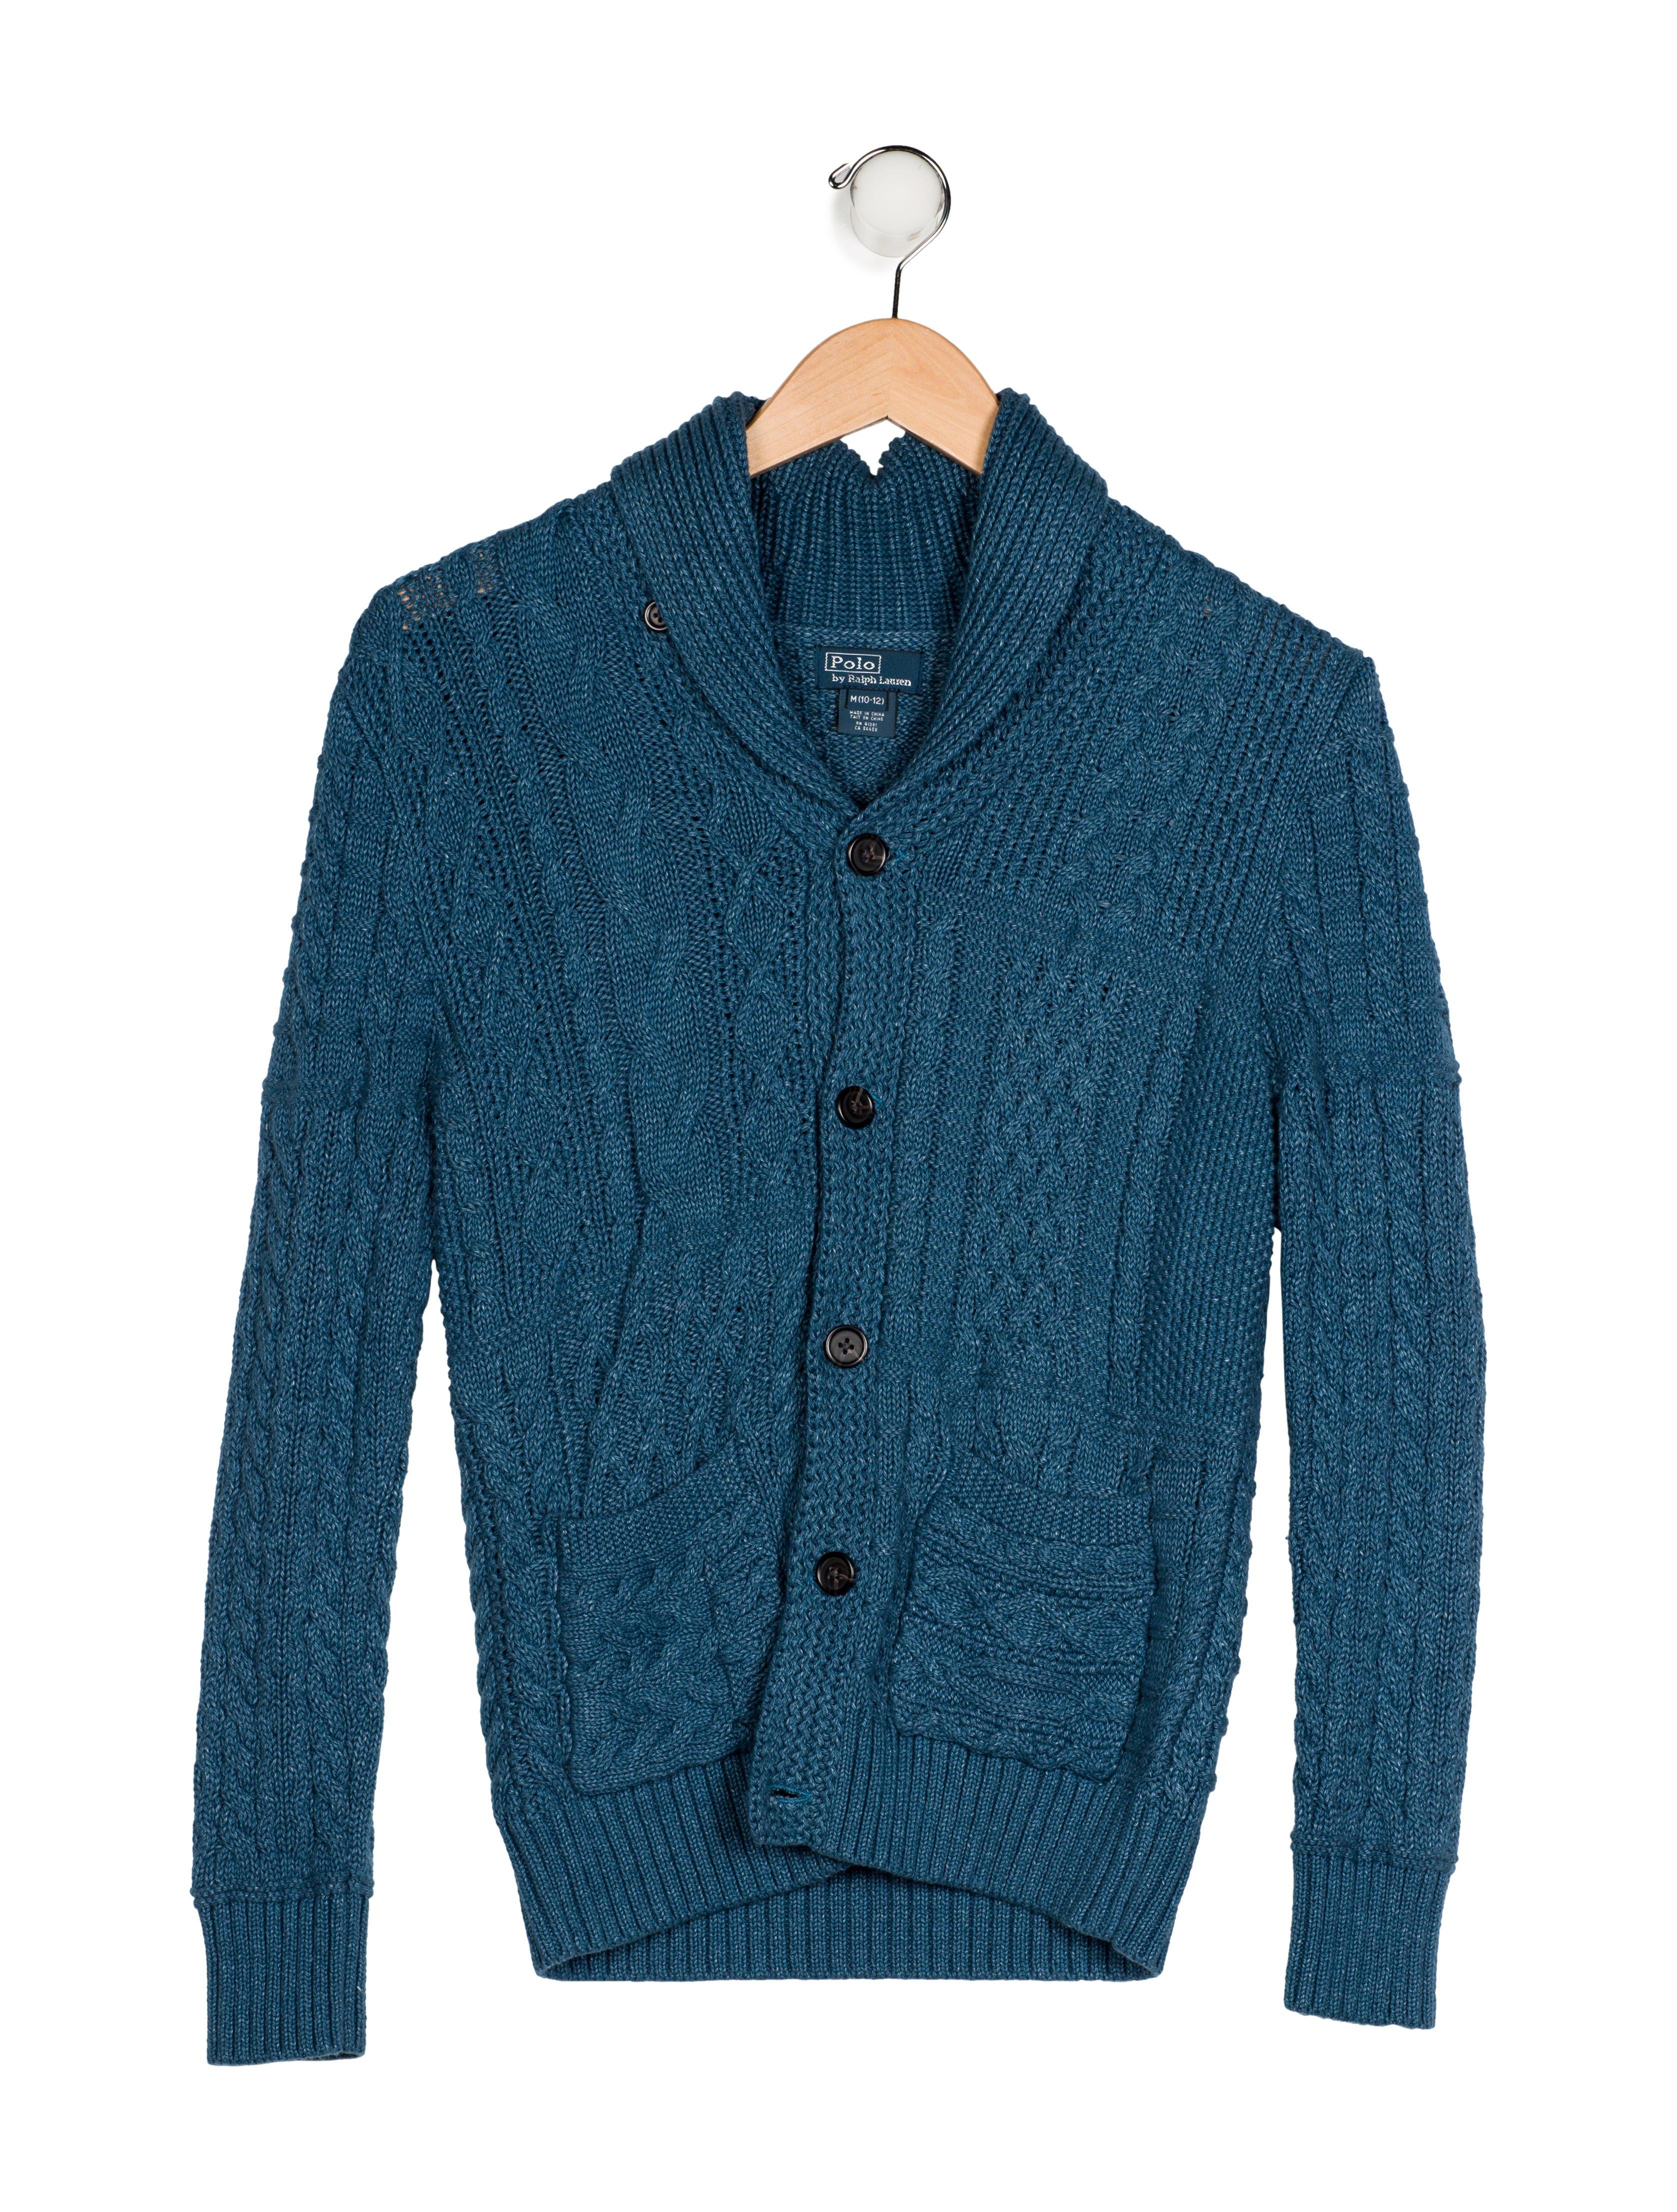 9a44e678c Polo Ralph Lauren Boys  Cable Knit Button-Up Sweater - Boys ...